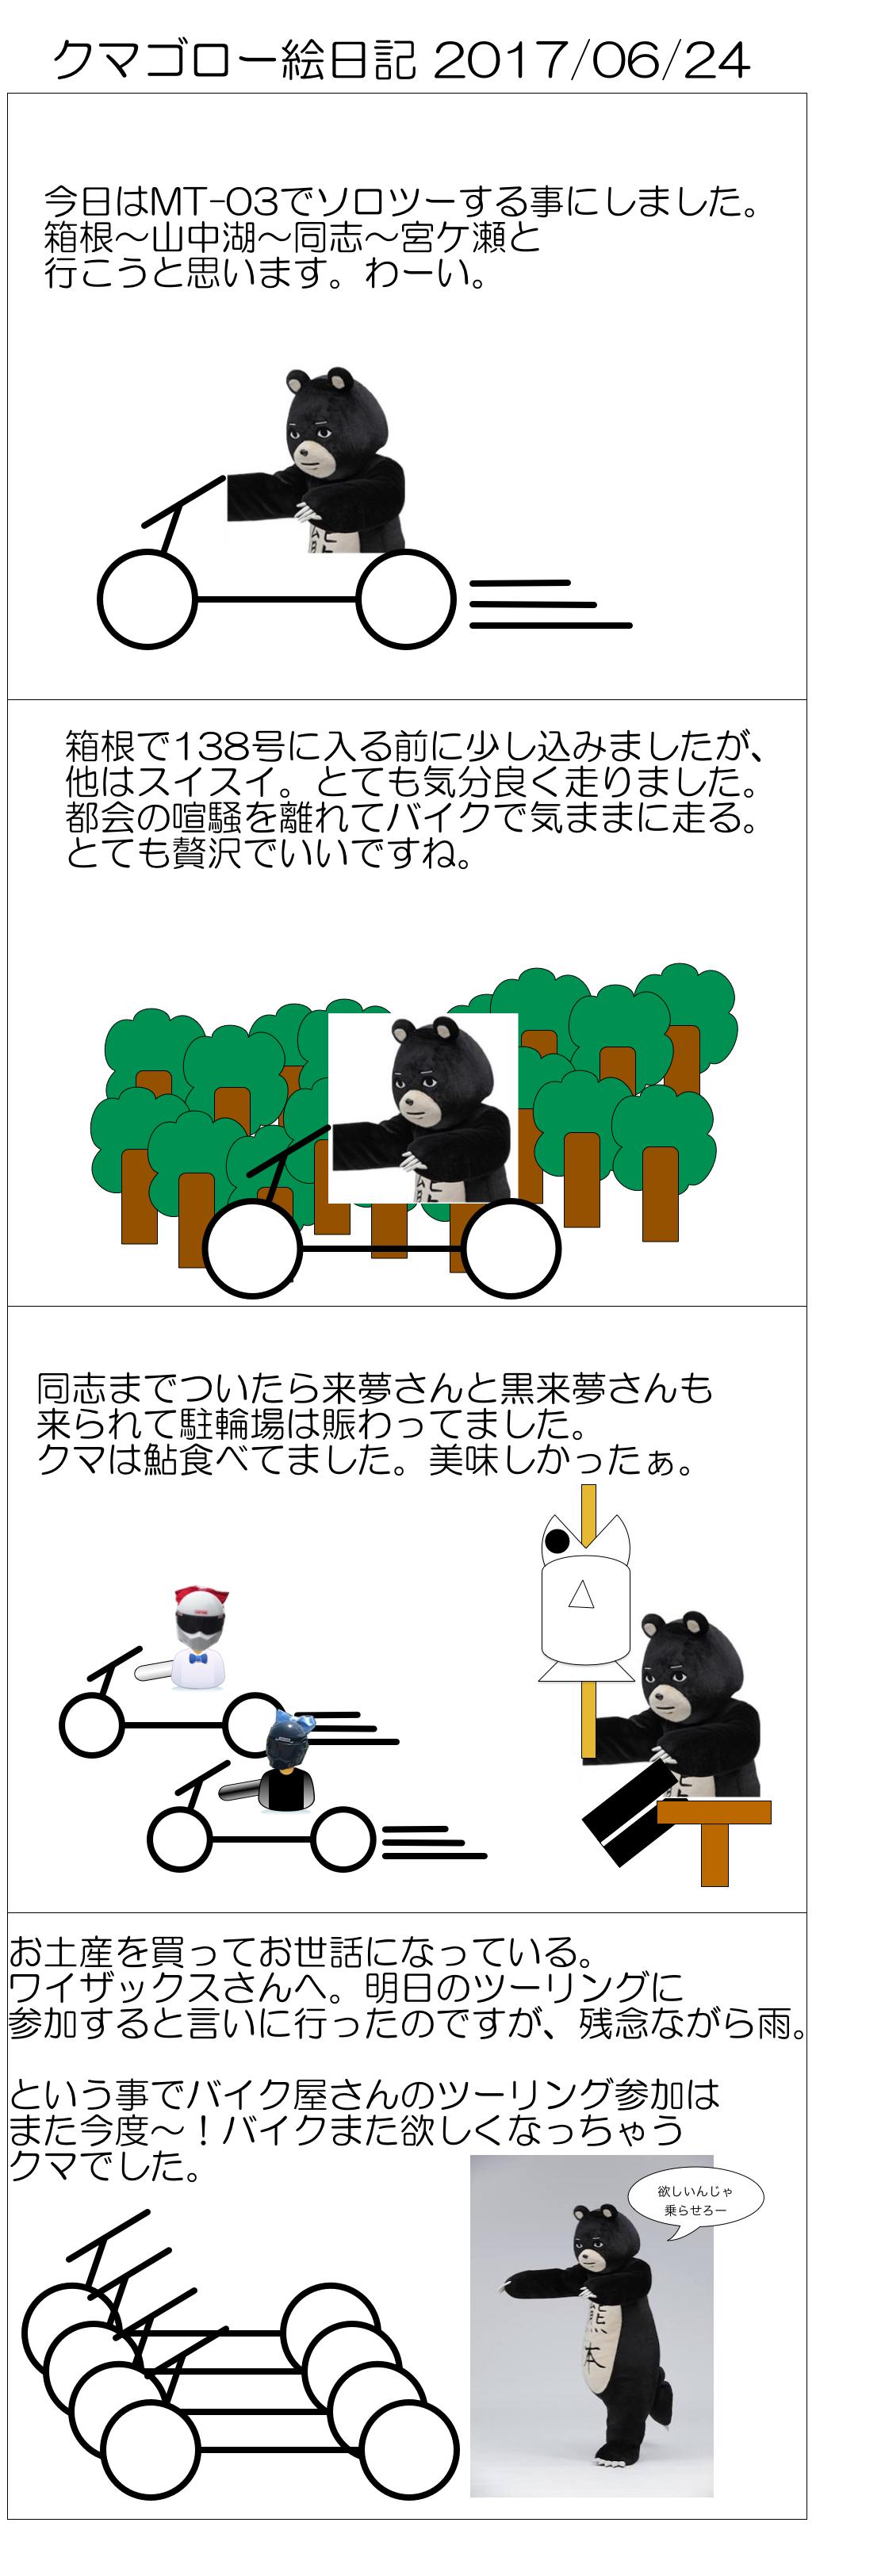 https://cdn-ak2.f.st-hatena.com/images/fotolife/k/kumagoro_bike/20170628/20170628163703_original.jpg